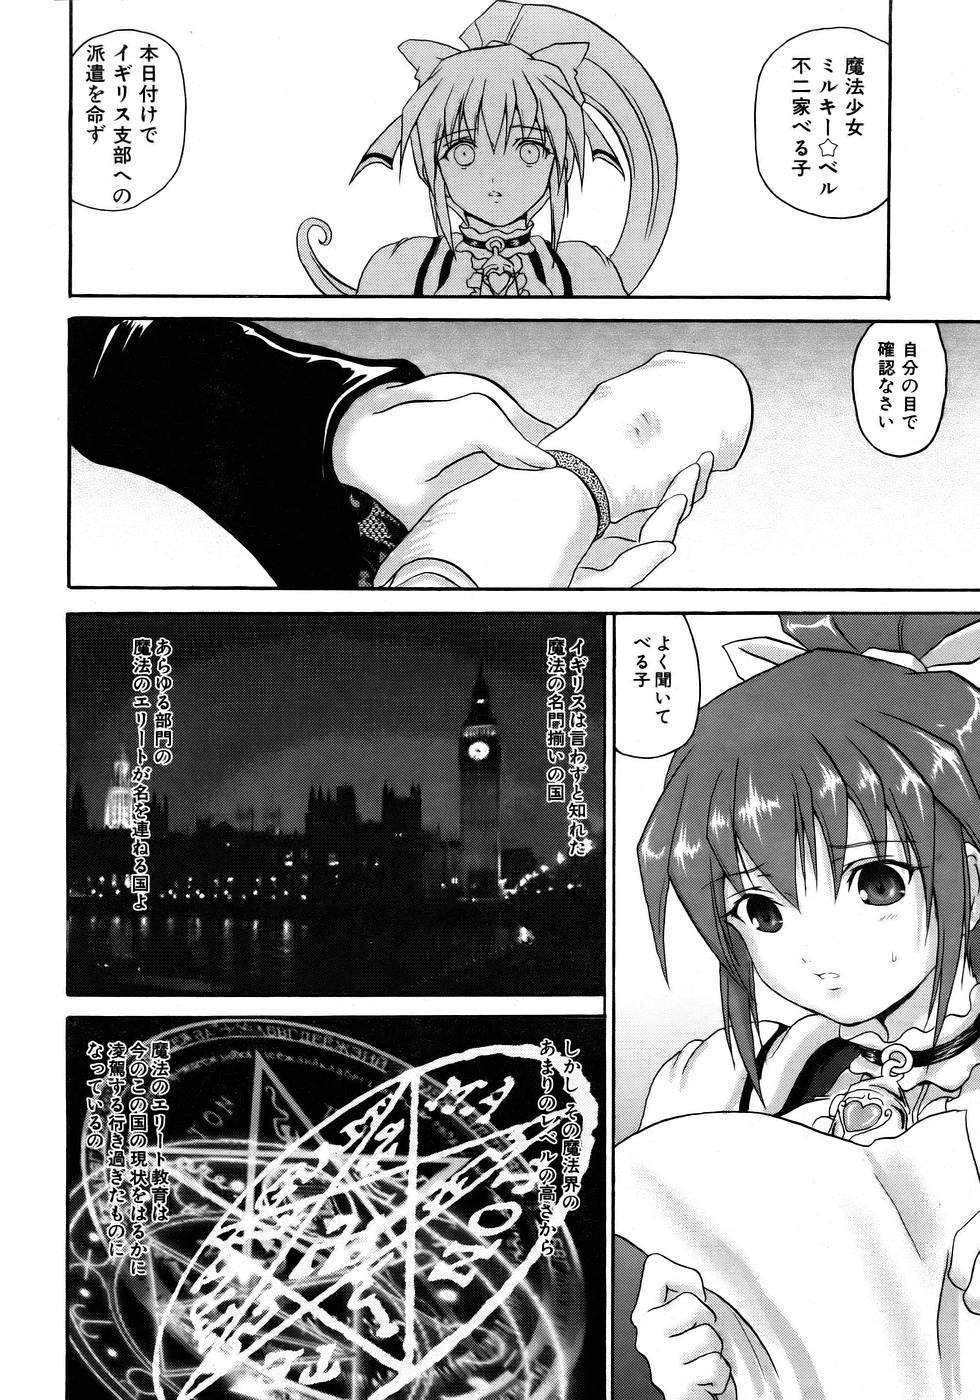 COMIC AUN 2005-12 Vol. 115 203